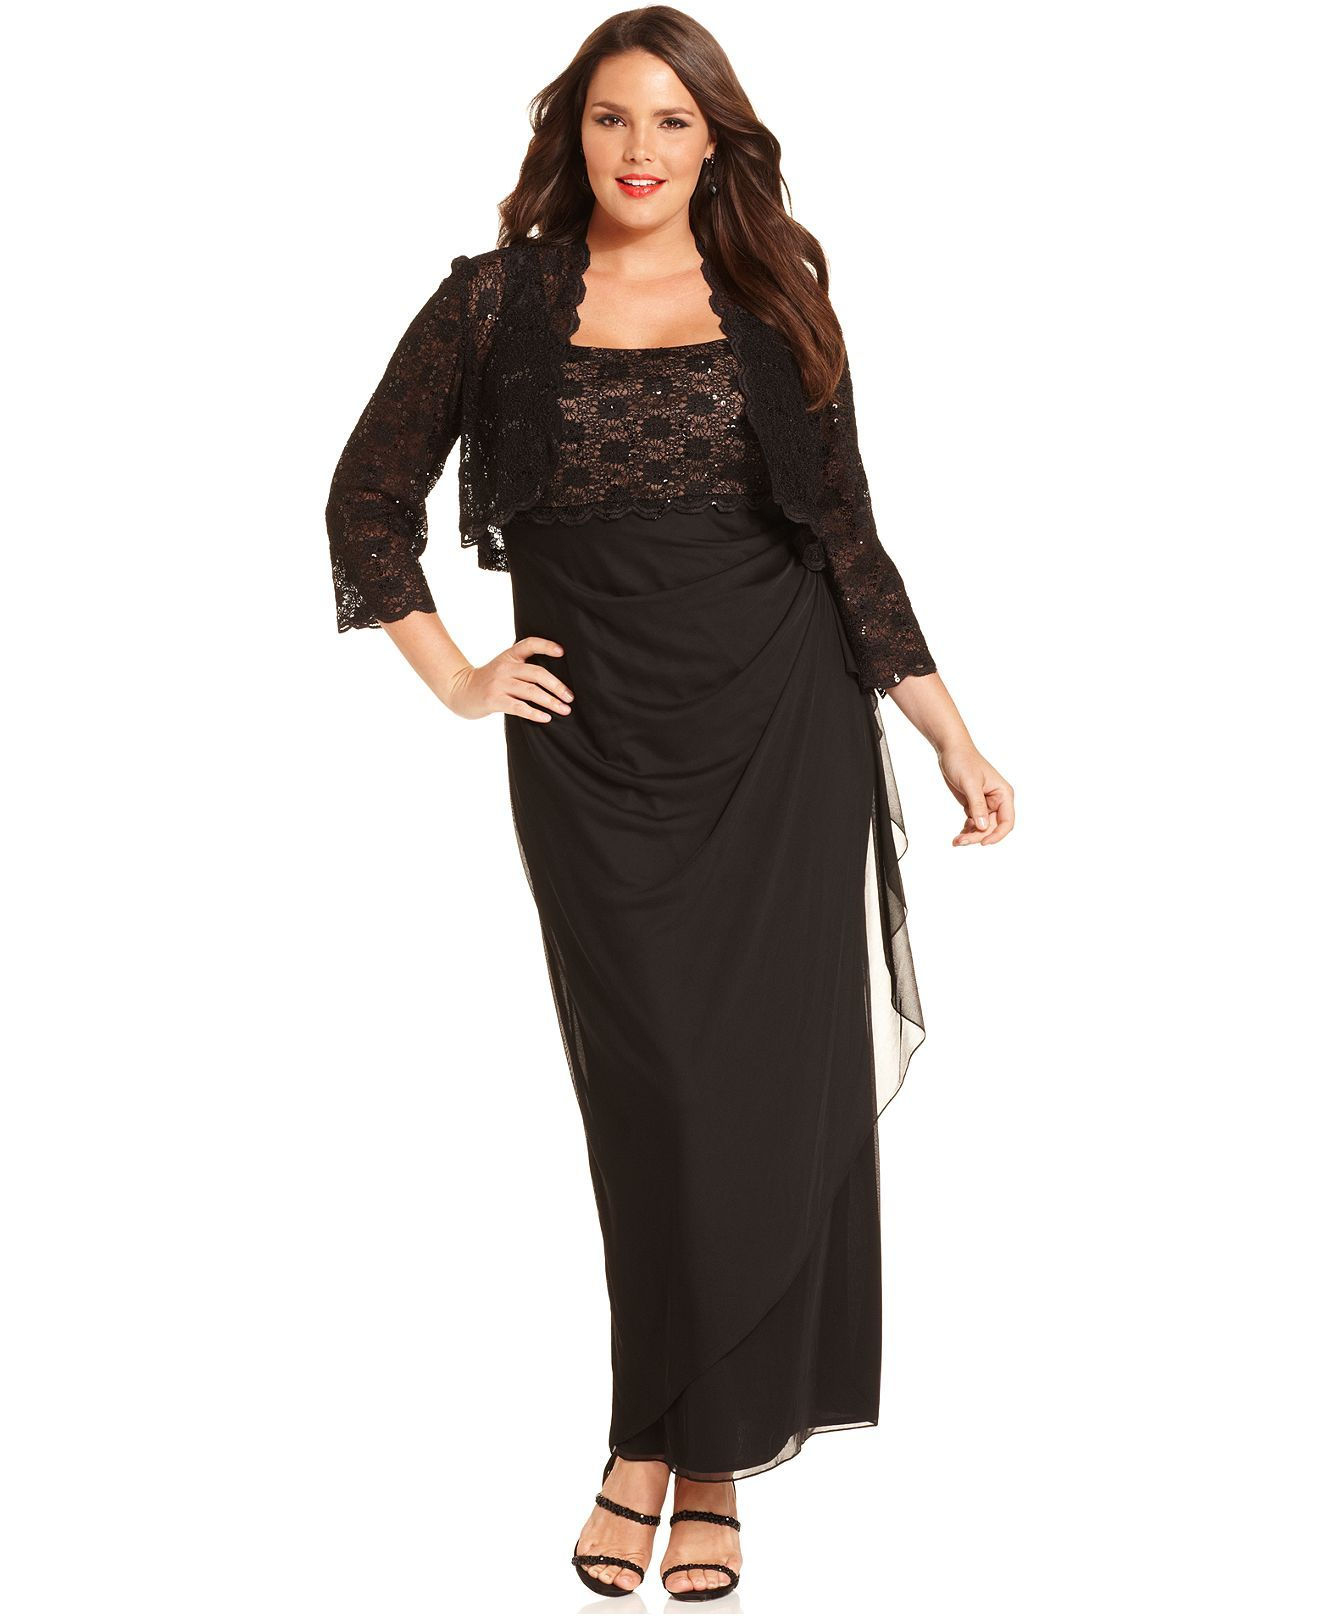 Black Plus Size Dresses Macys - raveitsafe